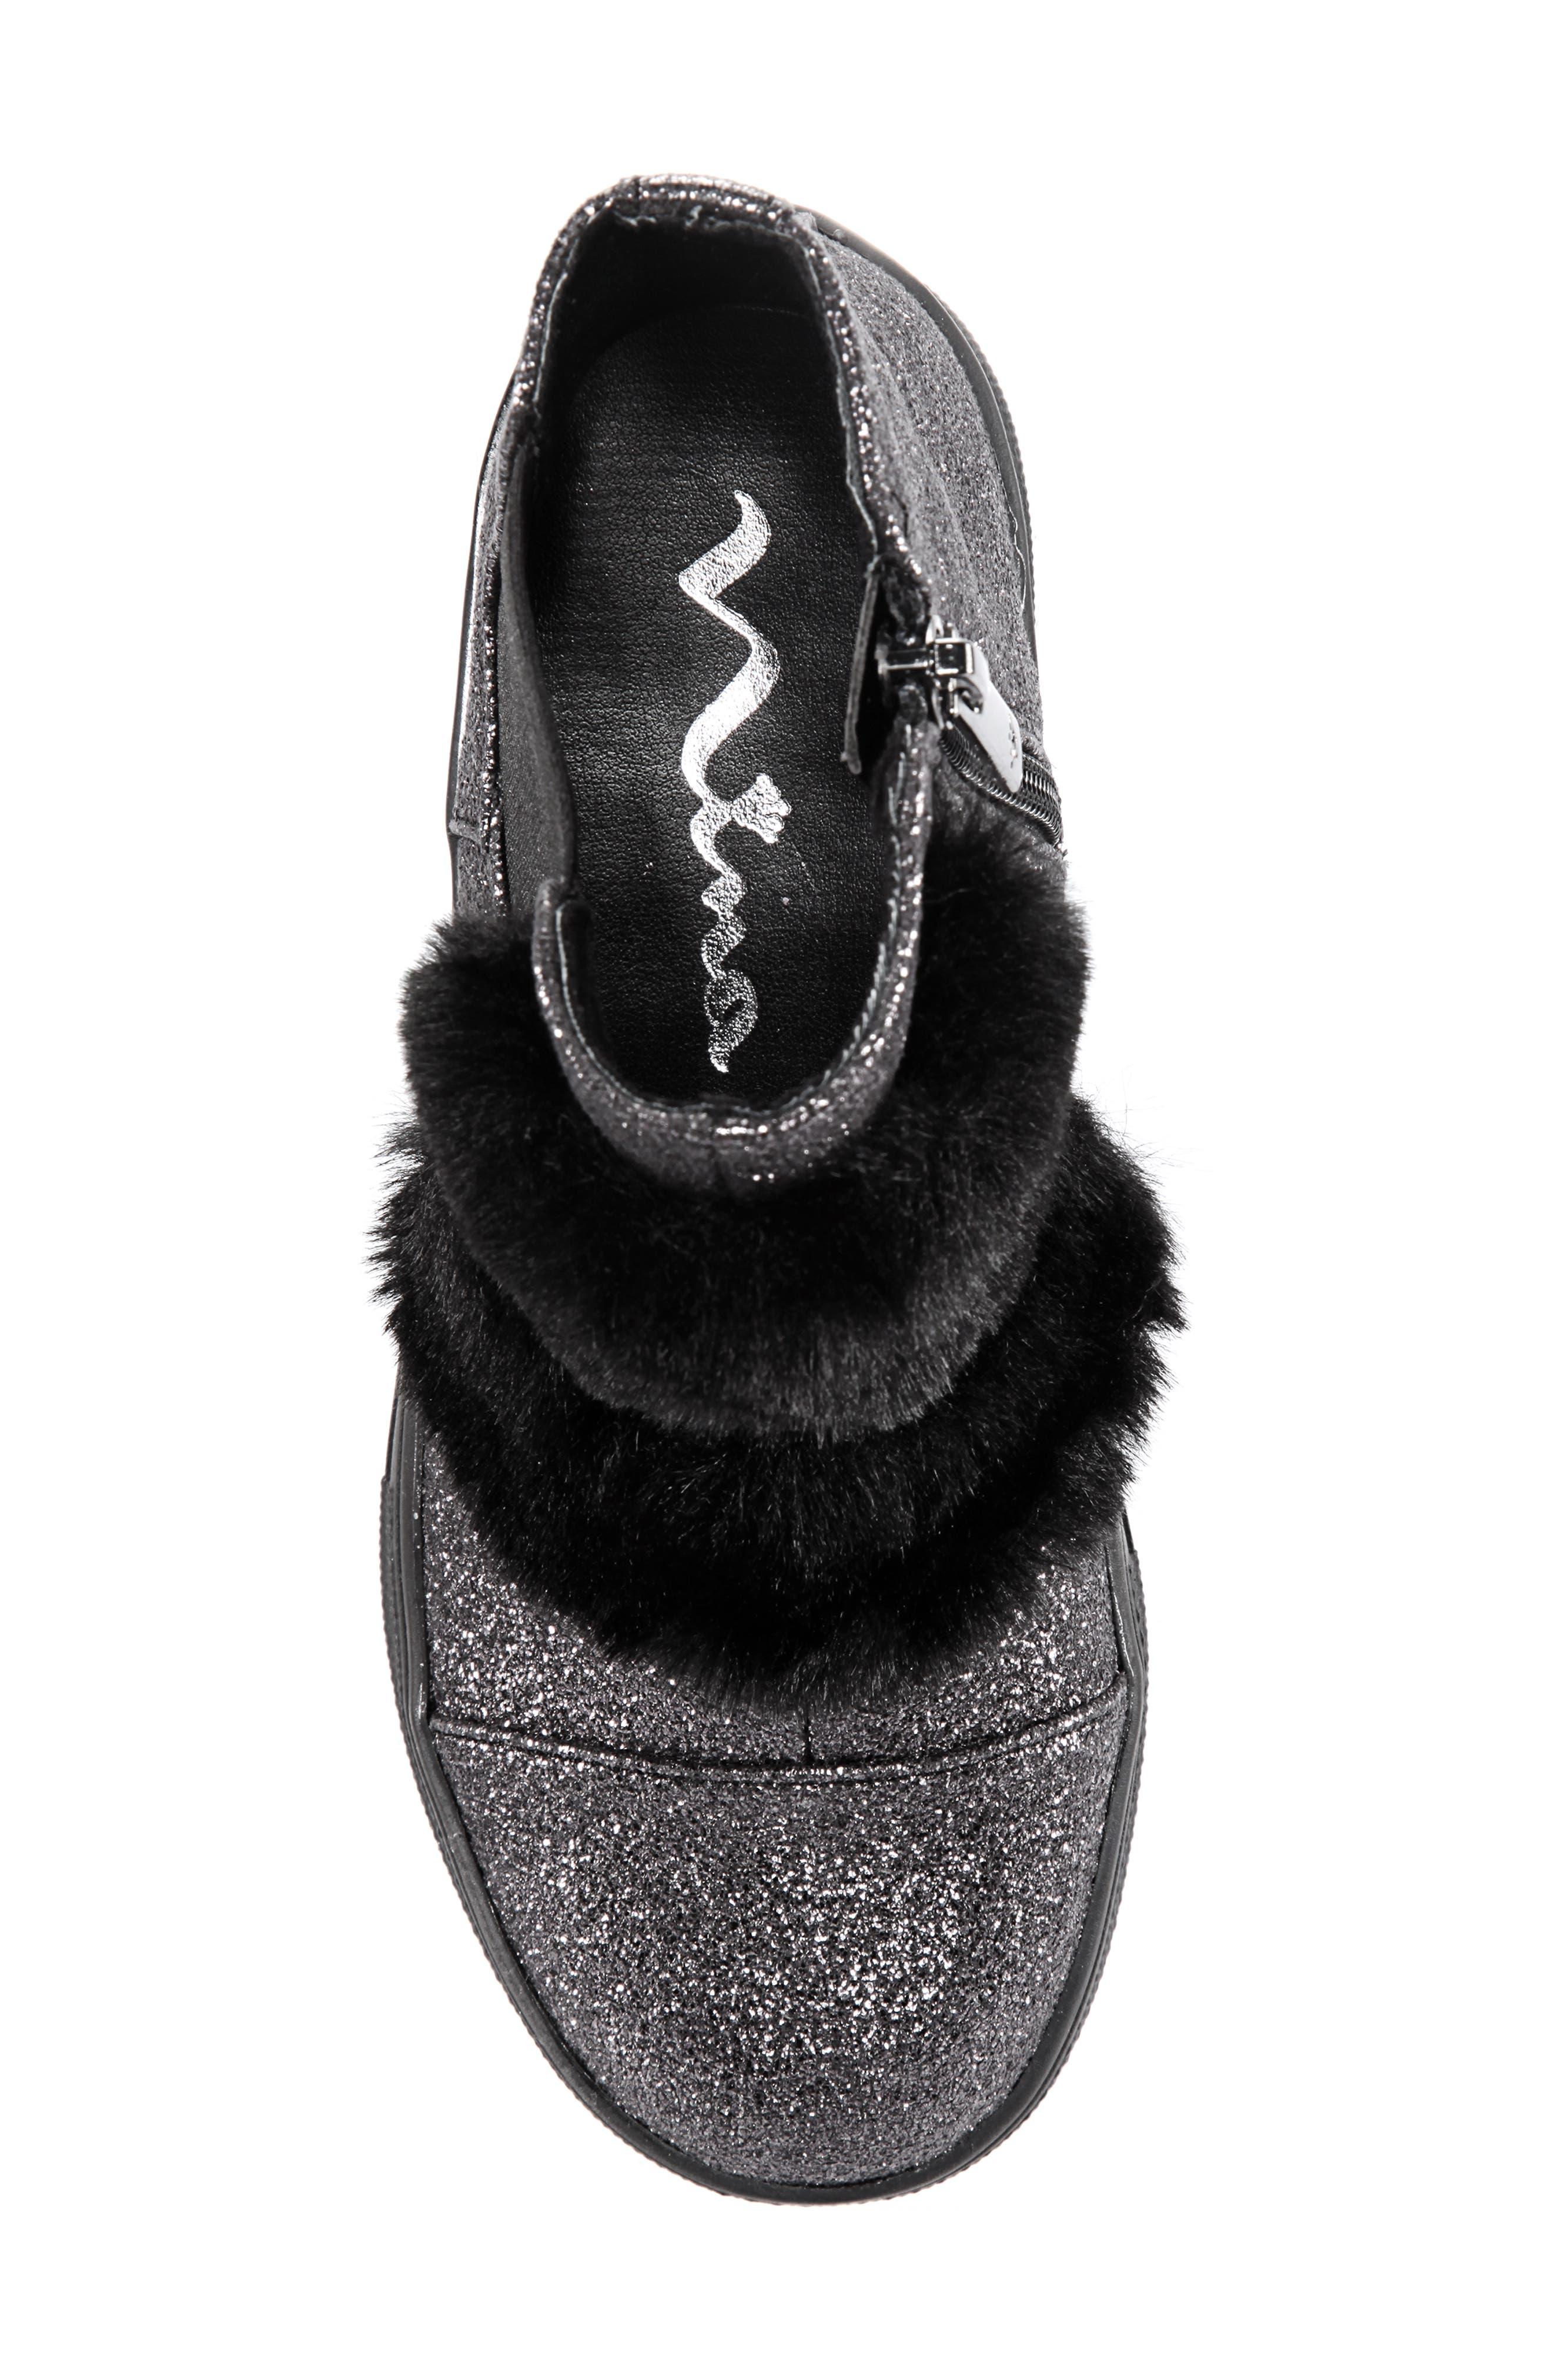 Helen Faux Fur Bootie Sneaker,                             Alternate thumbnail 5, color,                             PEWTER CRACKLE METALLIC